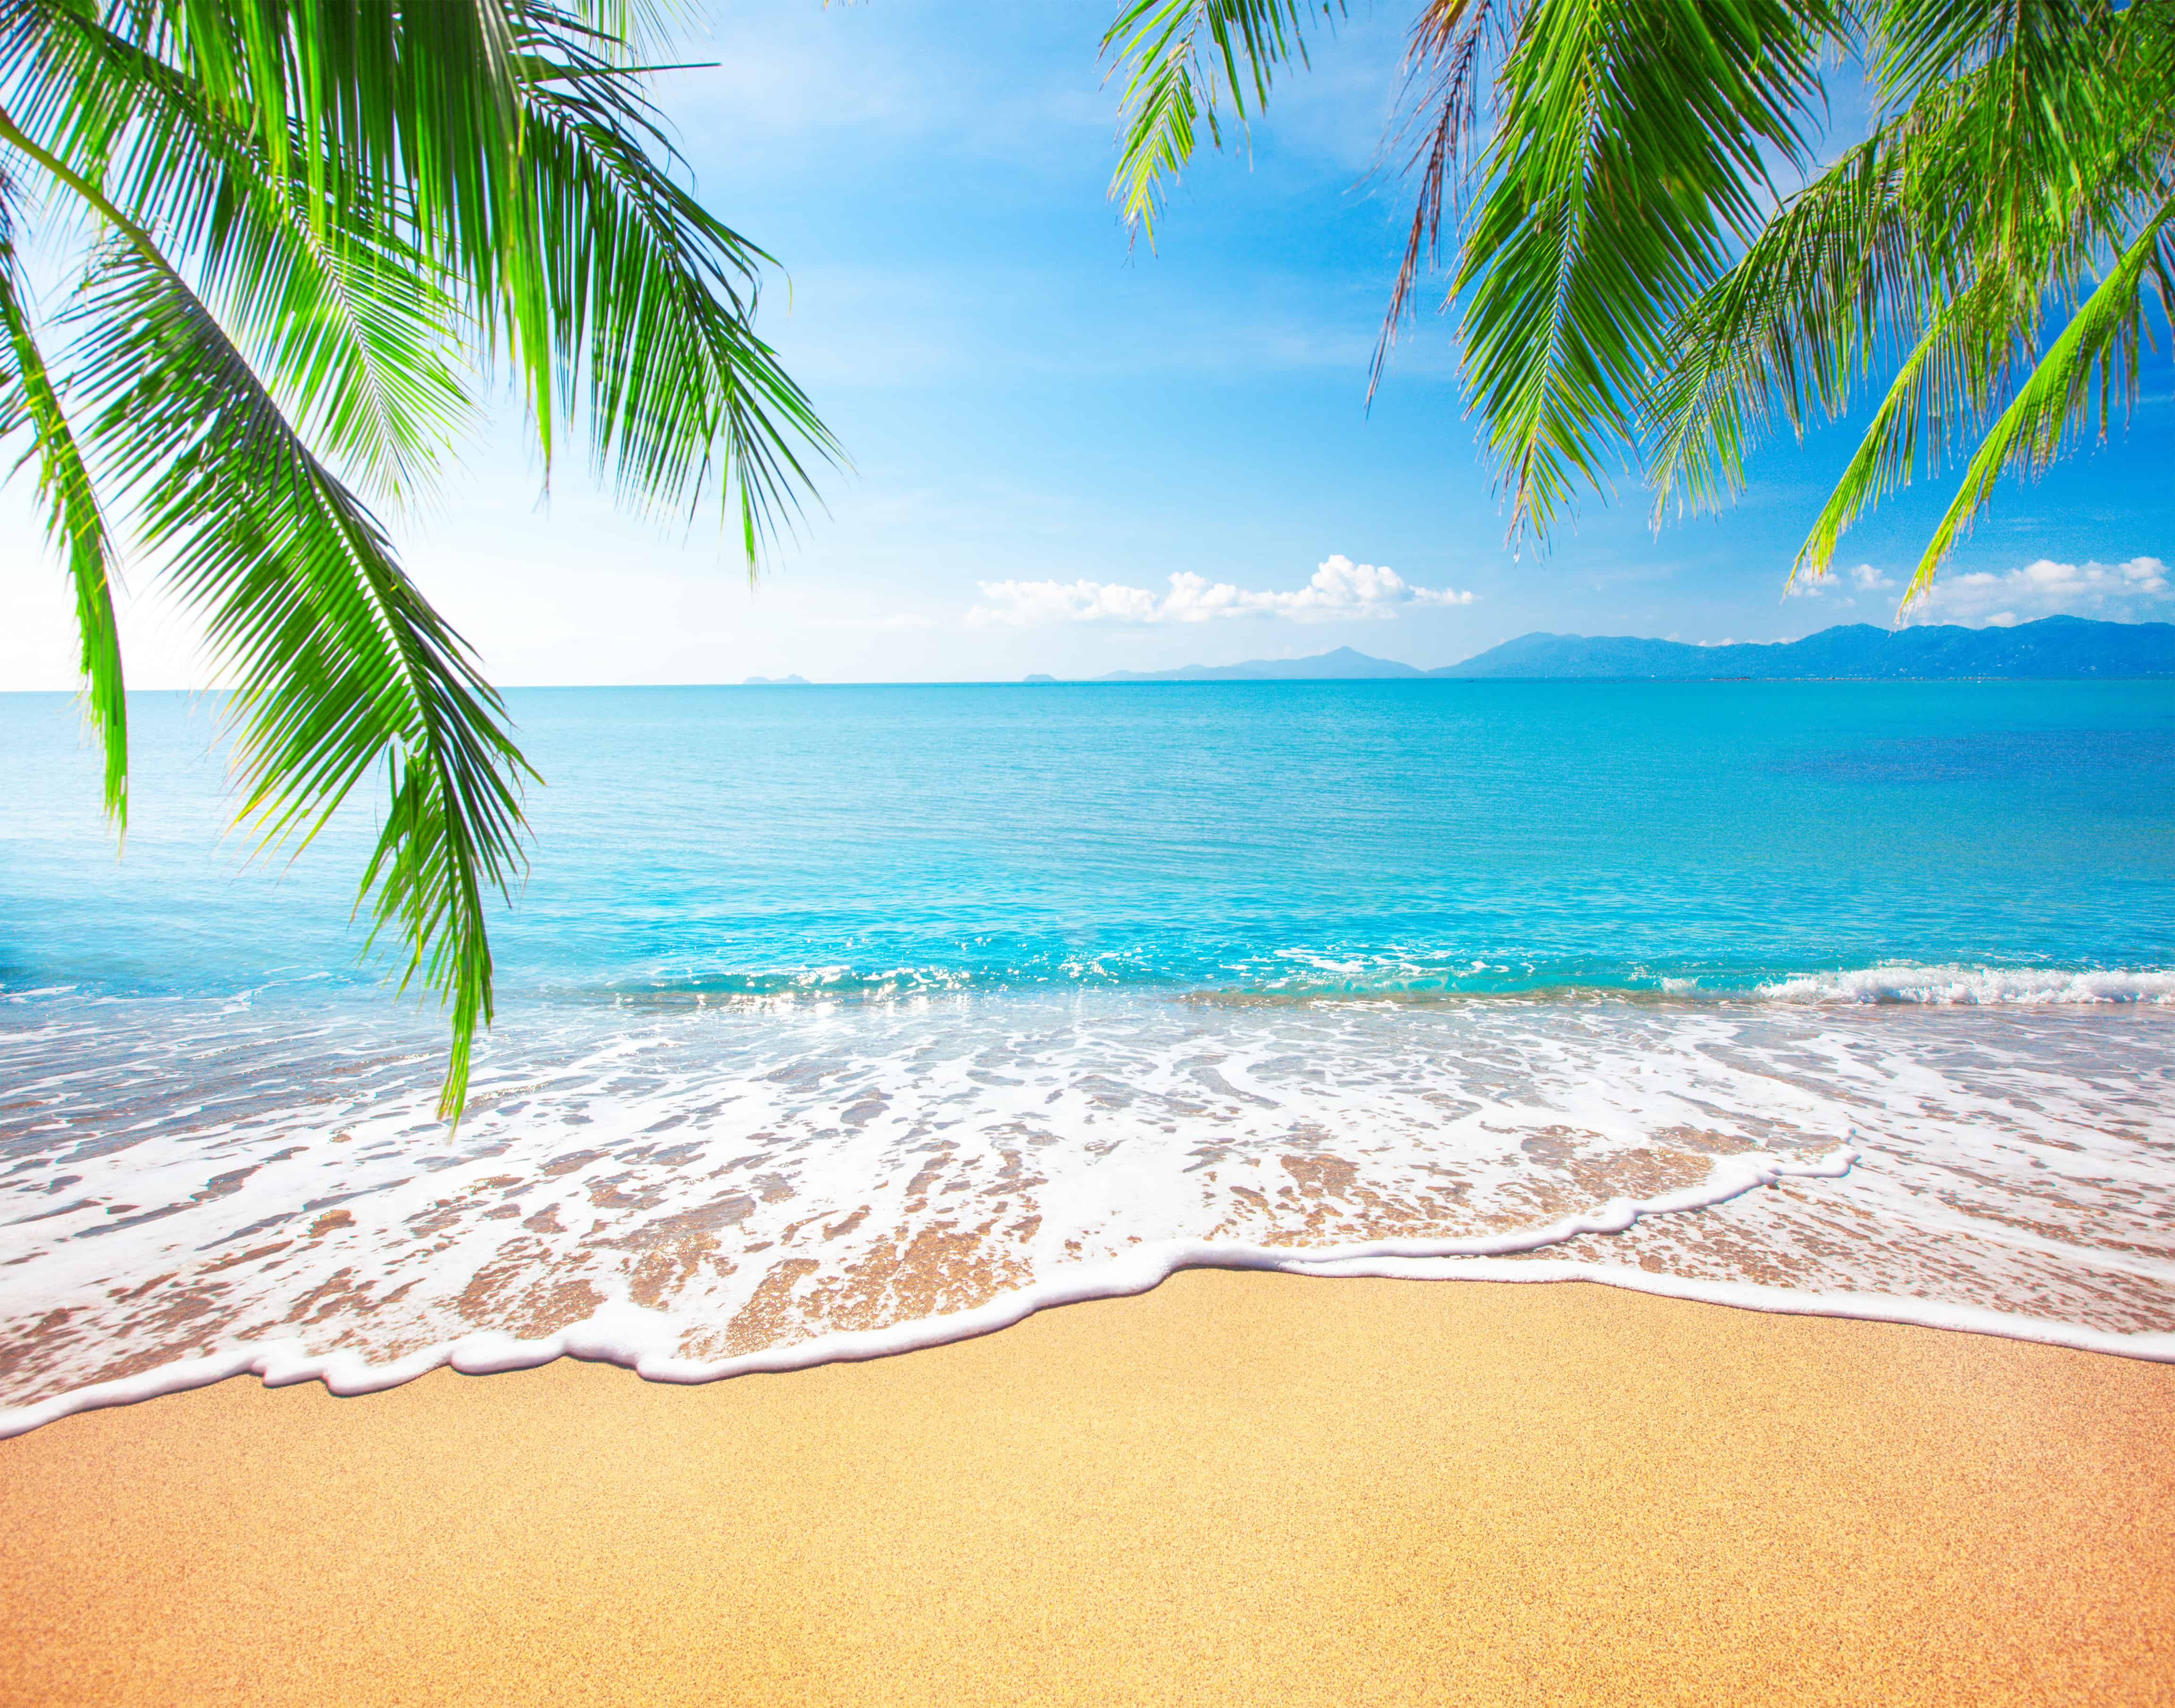 Bilder Beach